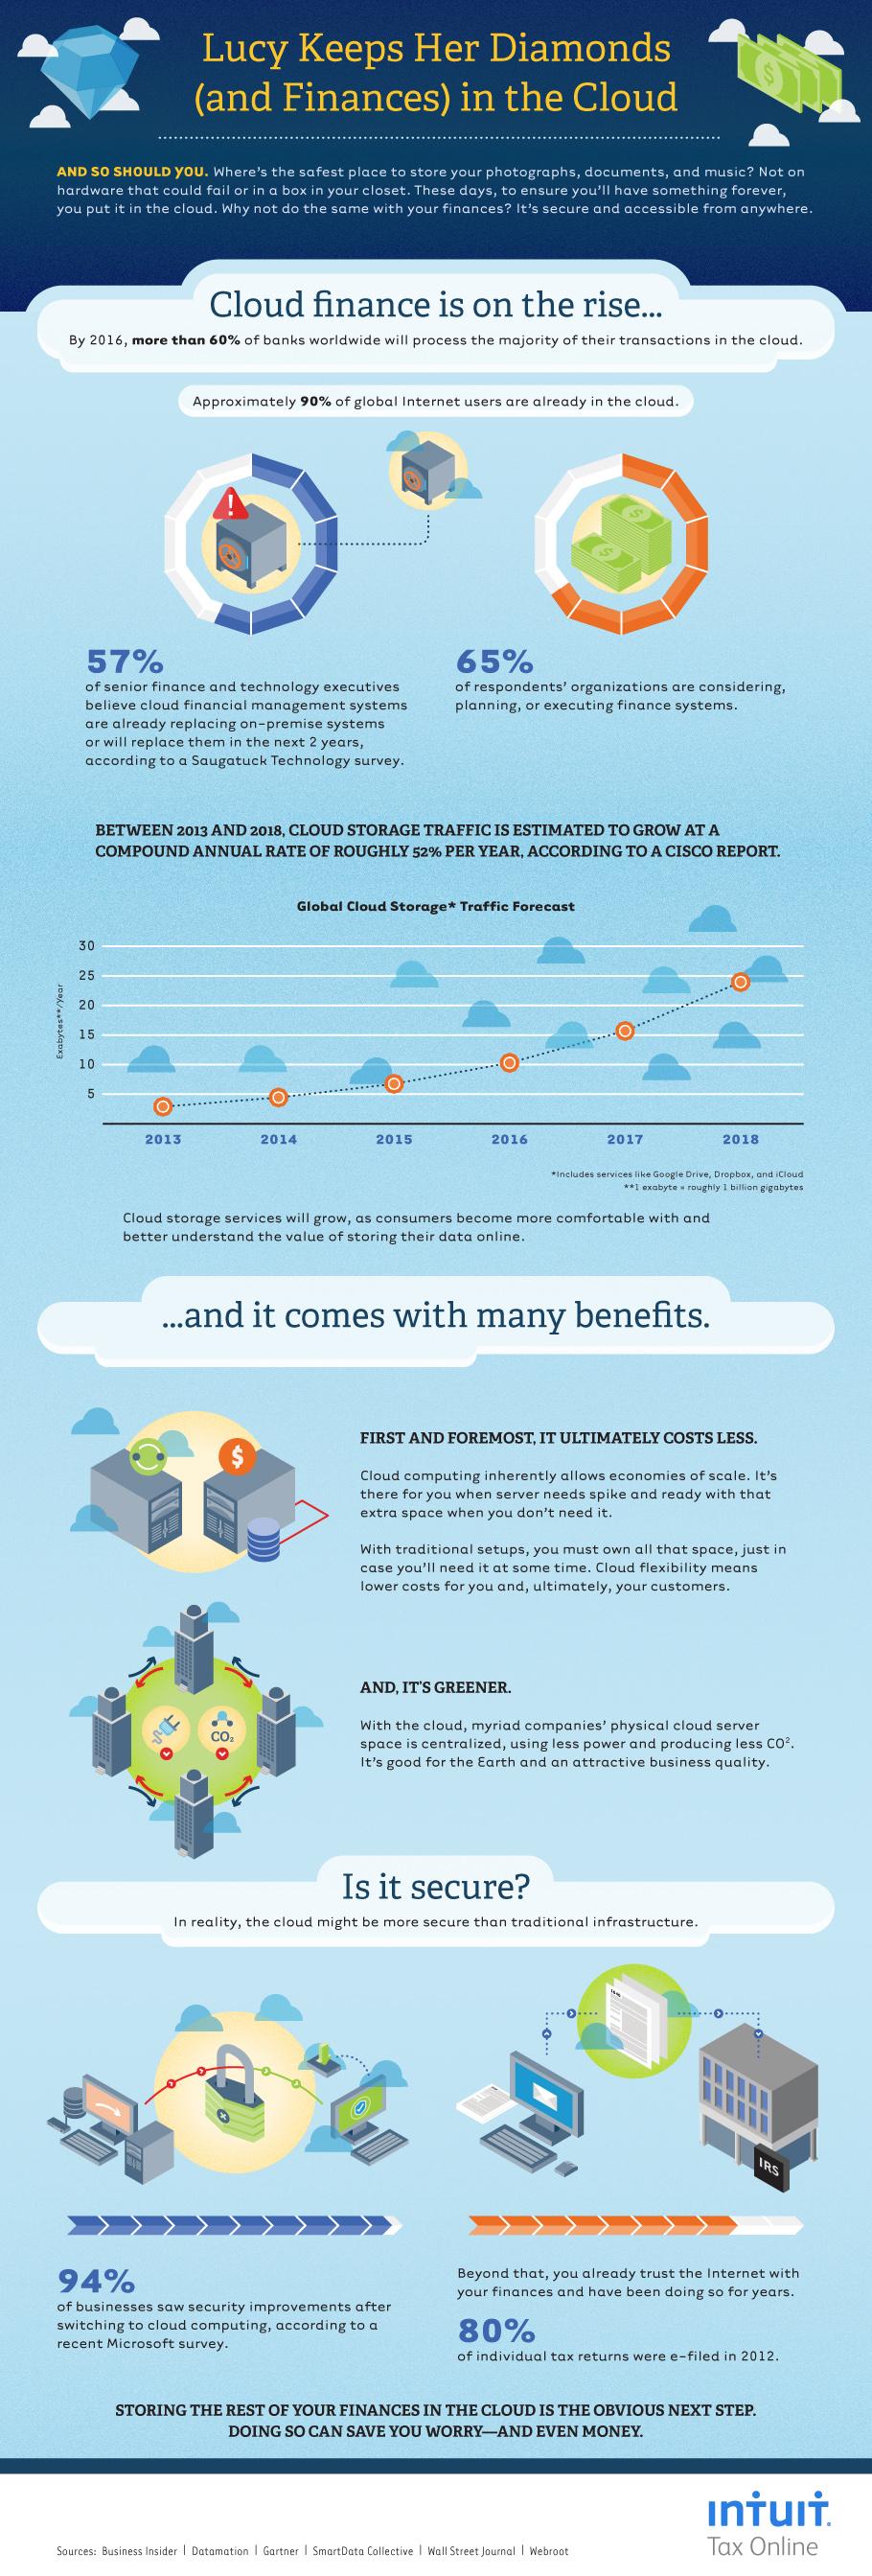 Intuit Cloud Computing